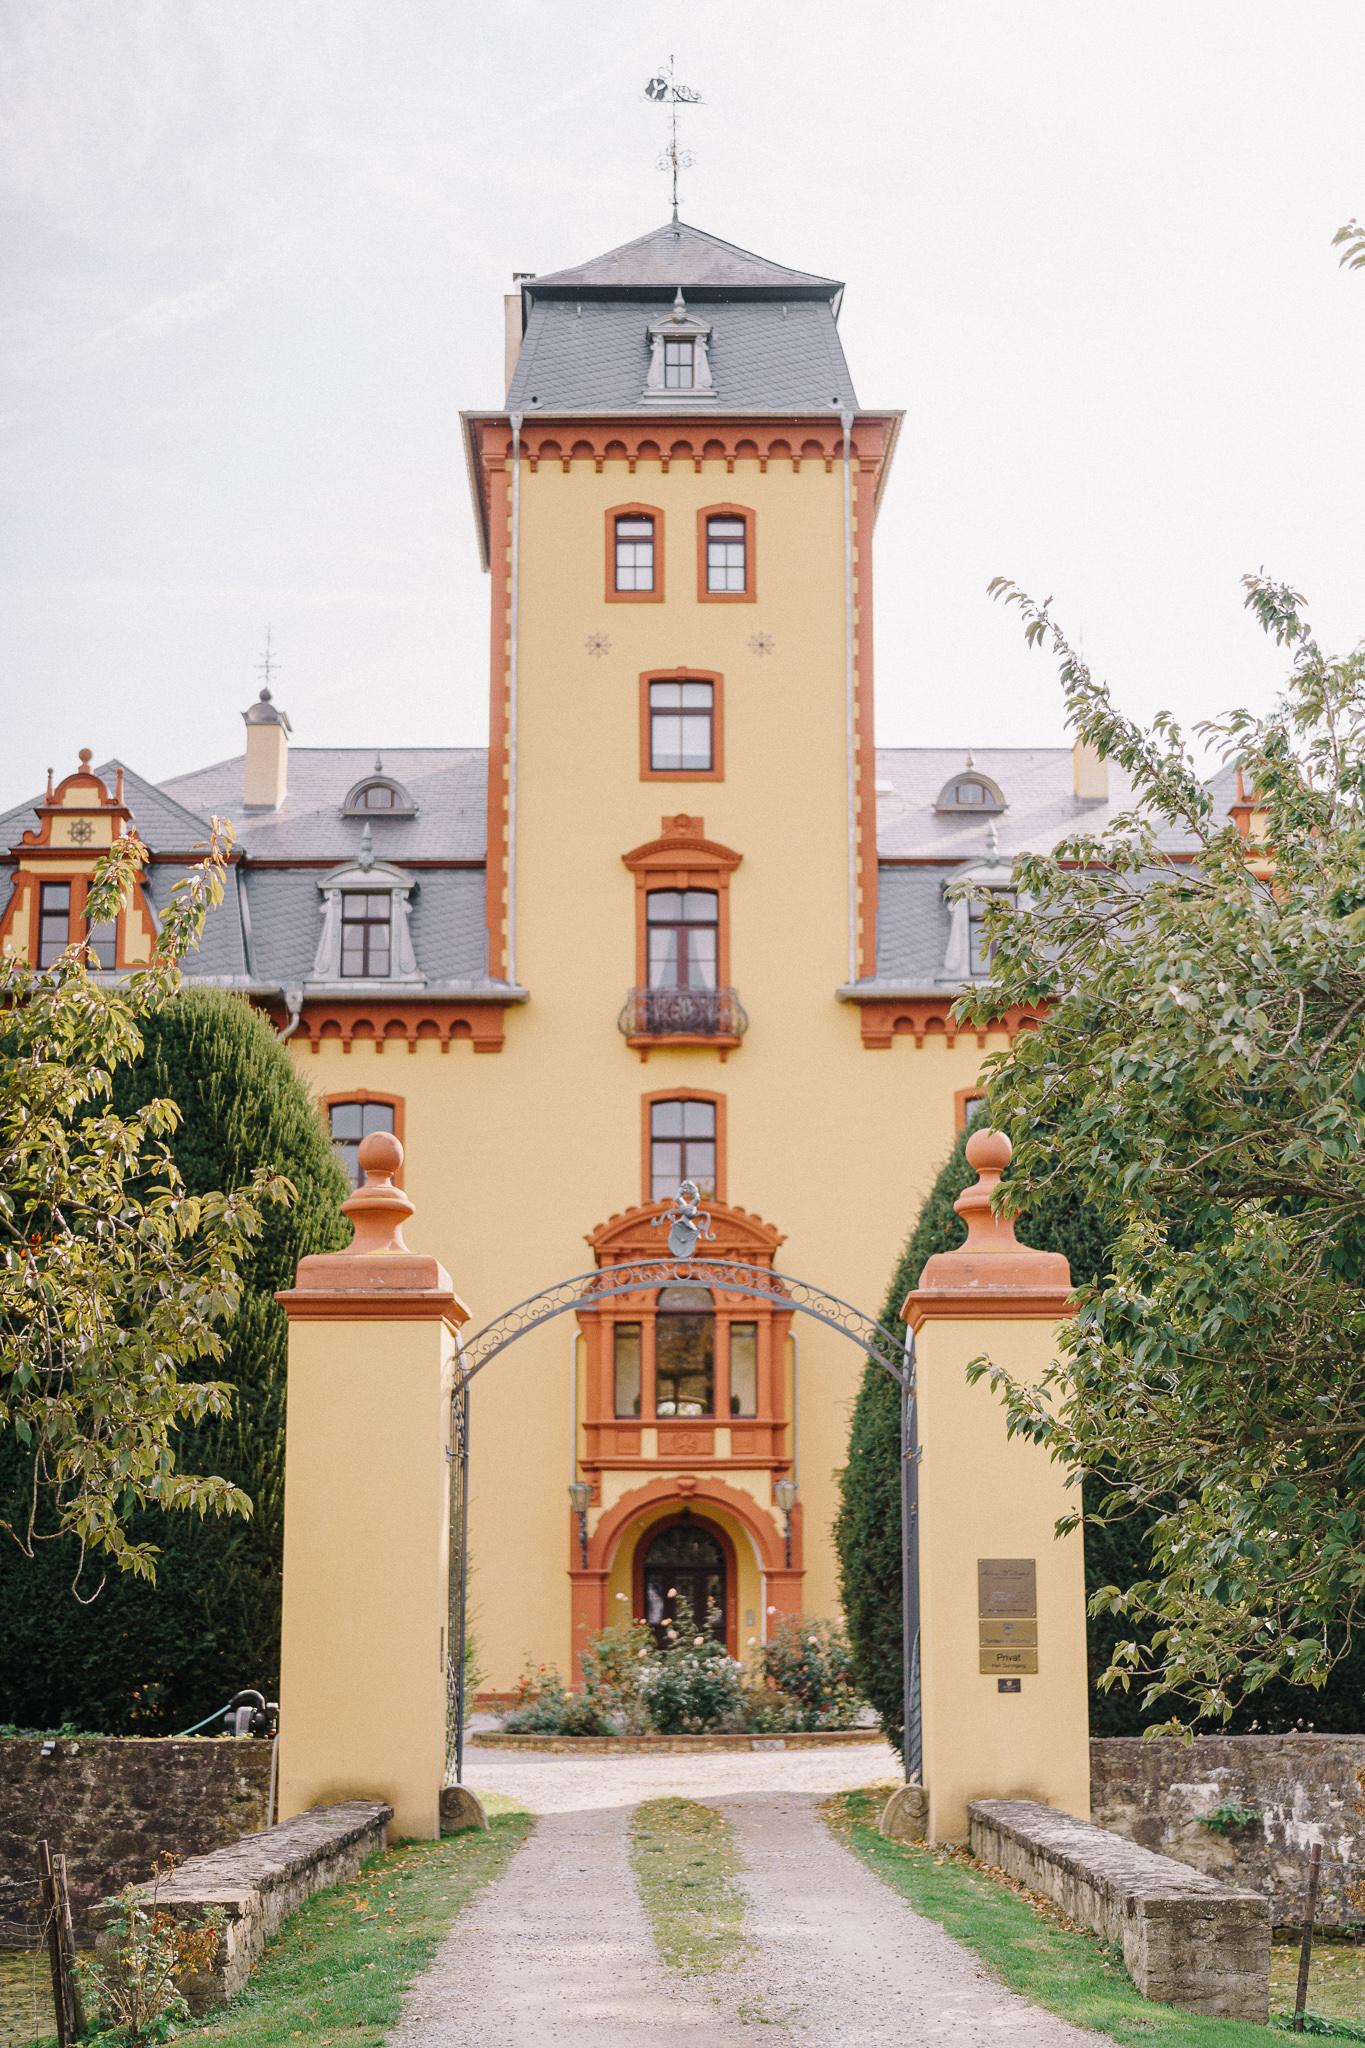 Glanzmomente-Schloss Wachendorf